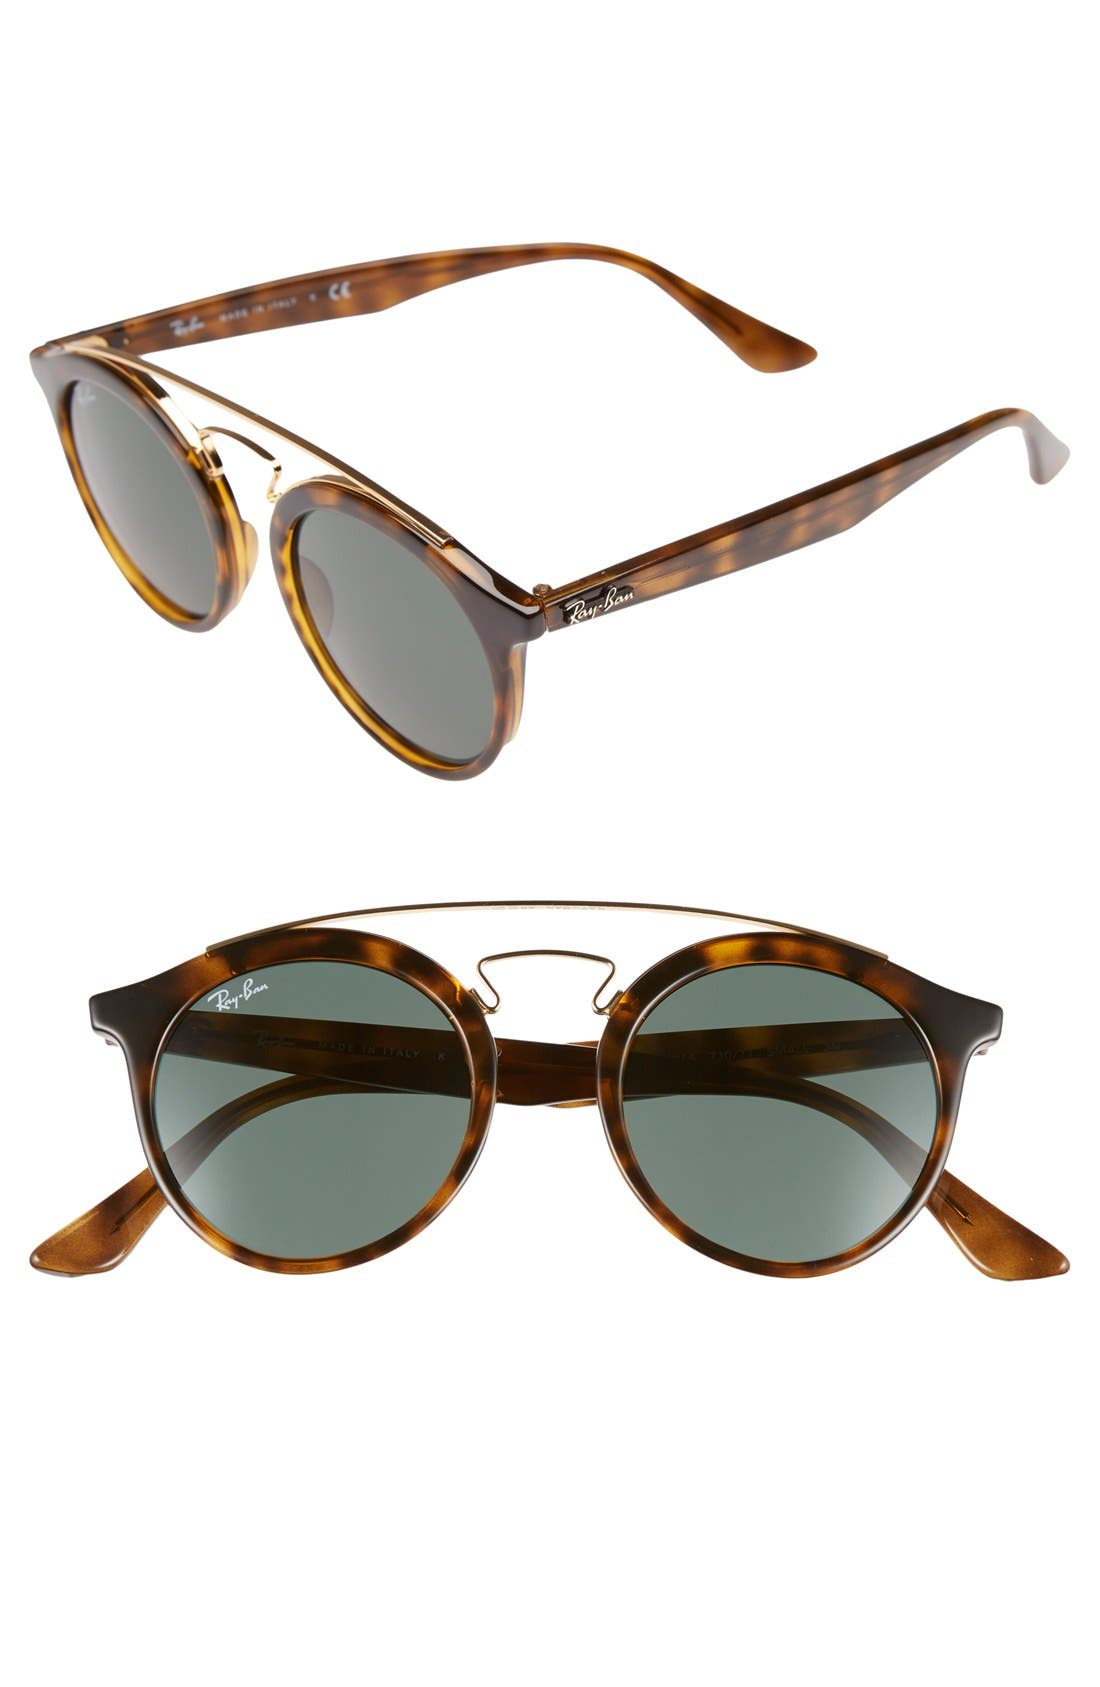 Main Image - Ray-Ban Highstreet 46mm Sunglasses